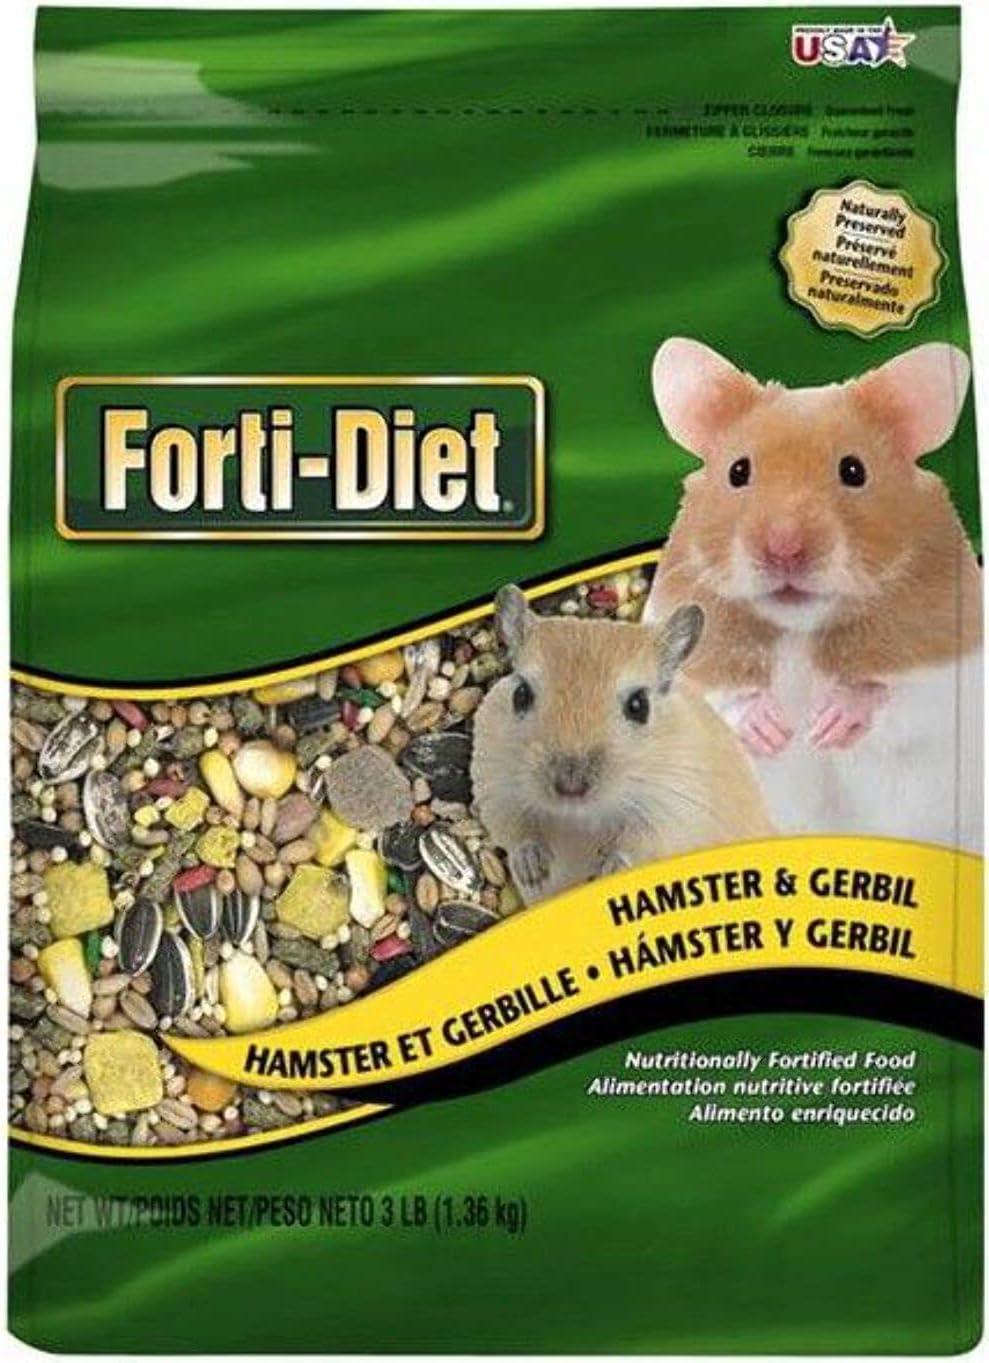 Kaytee Forti-Diet Hamster And Gerbil Food, 3-Pound